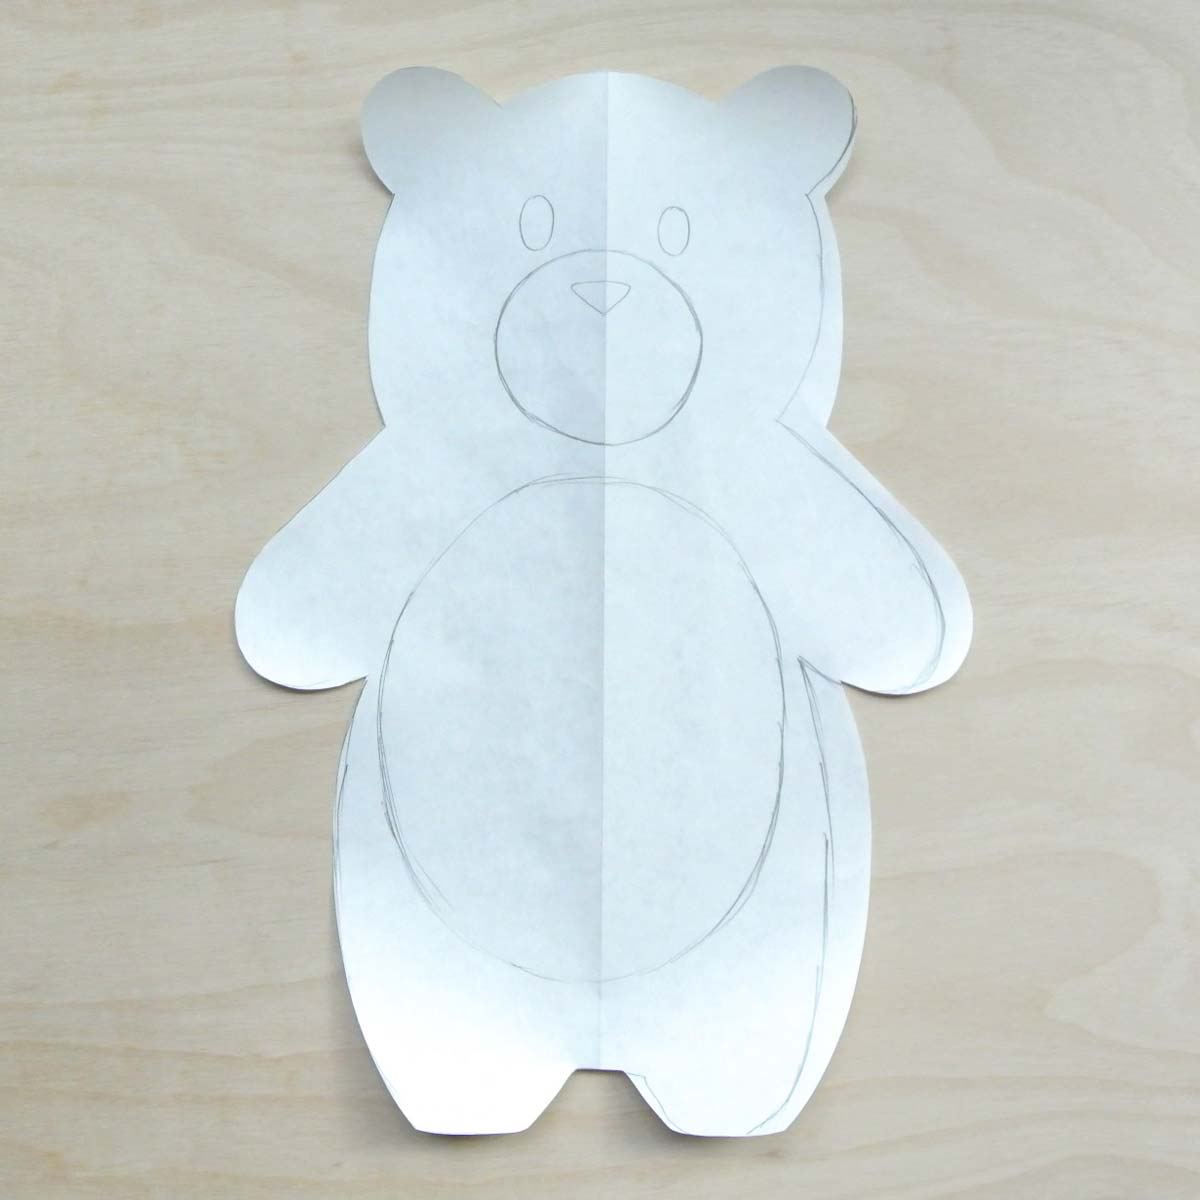 Bear Plush Pattern Cut out symmetrically. How to Make Plushie Tutorial